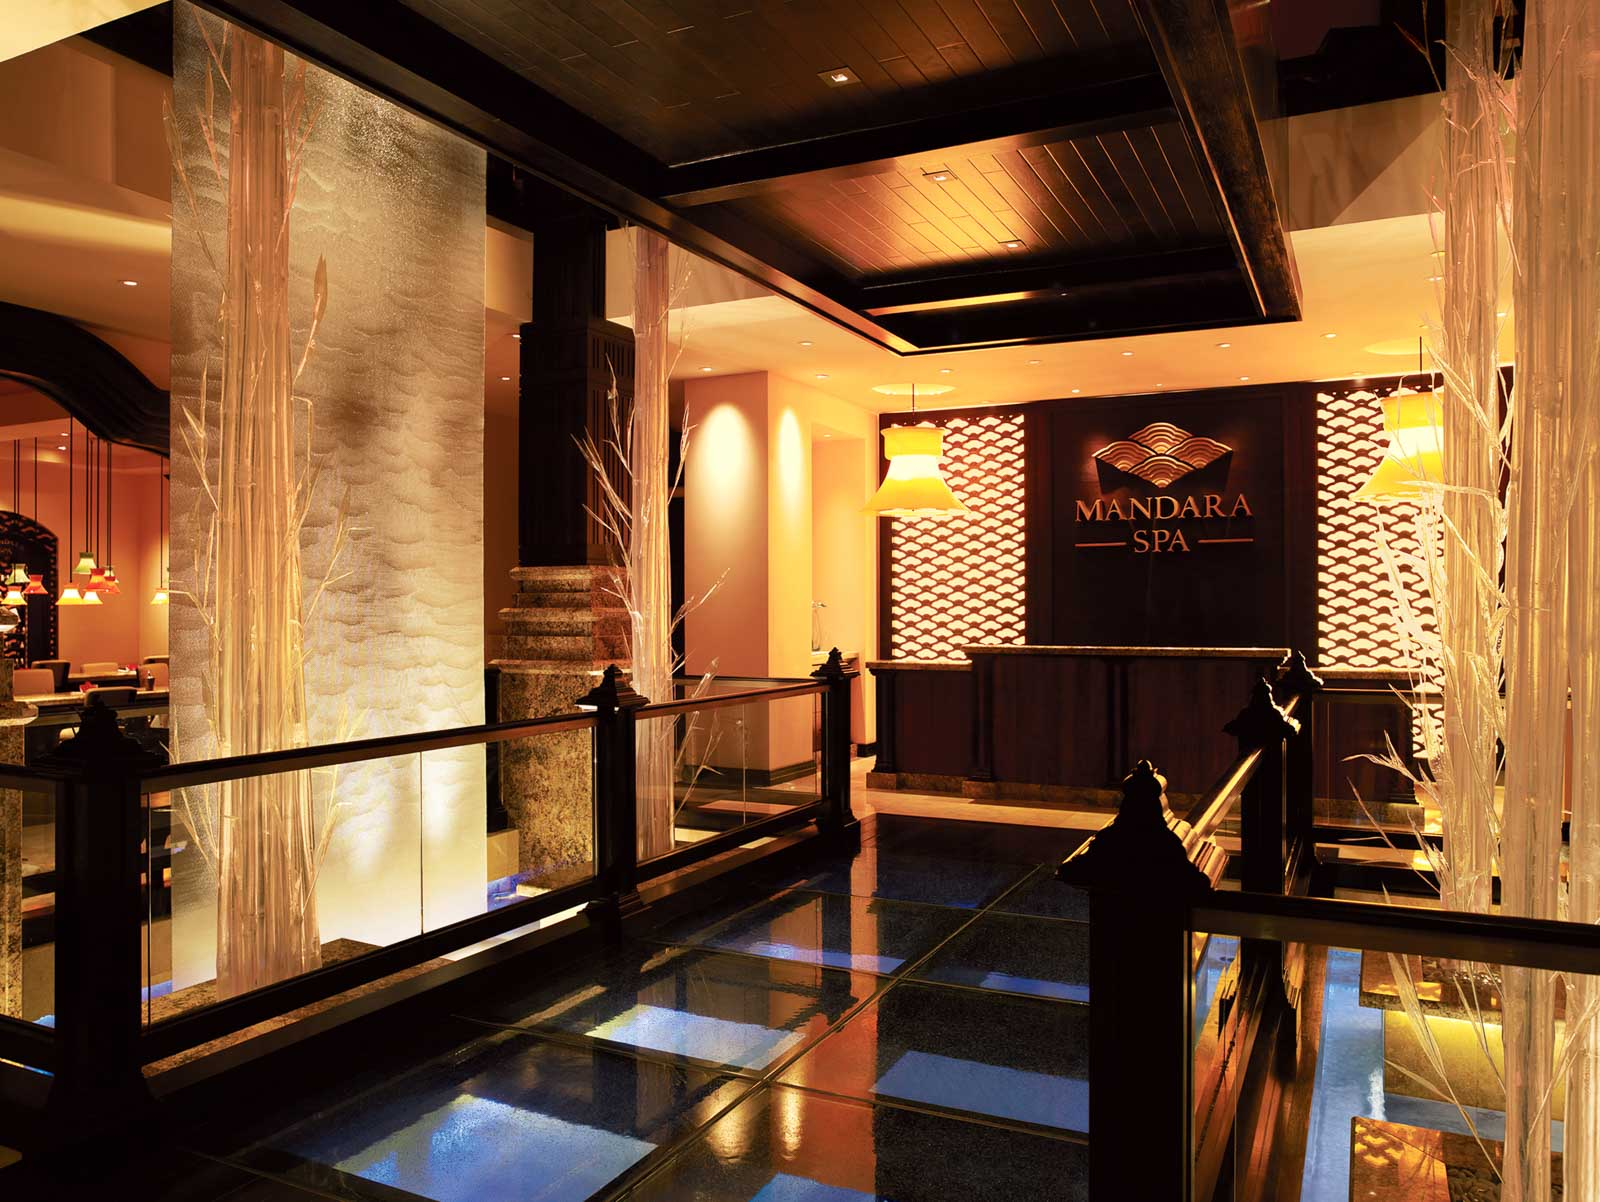 Mandara SPA Atlantis Hotel